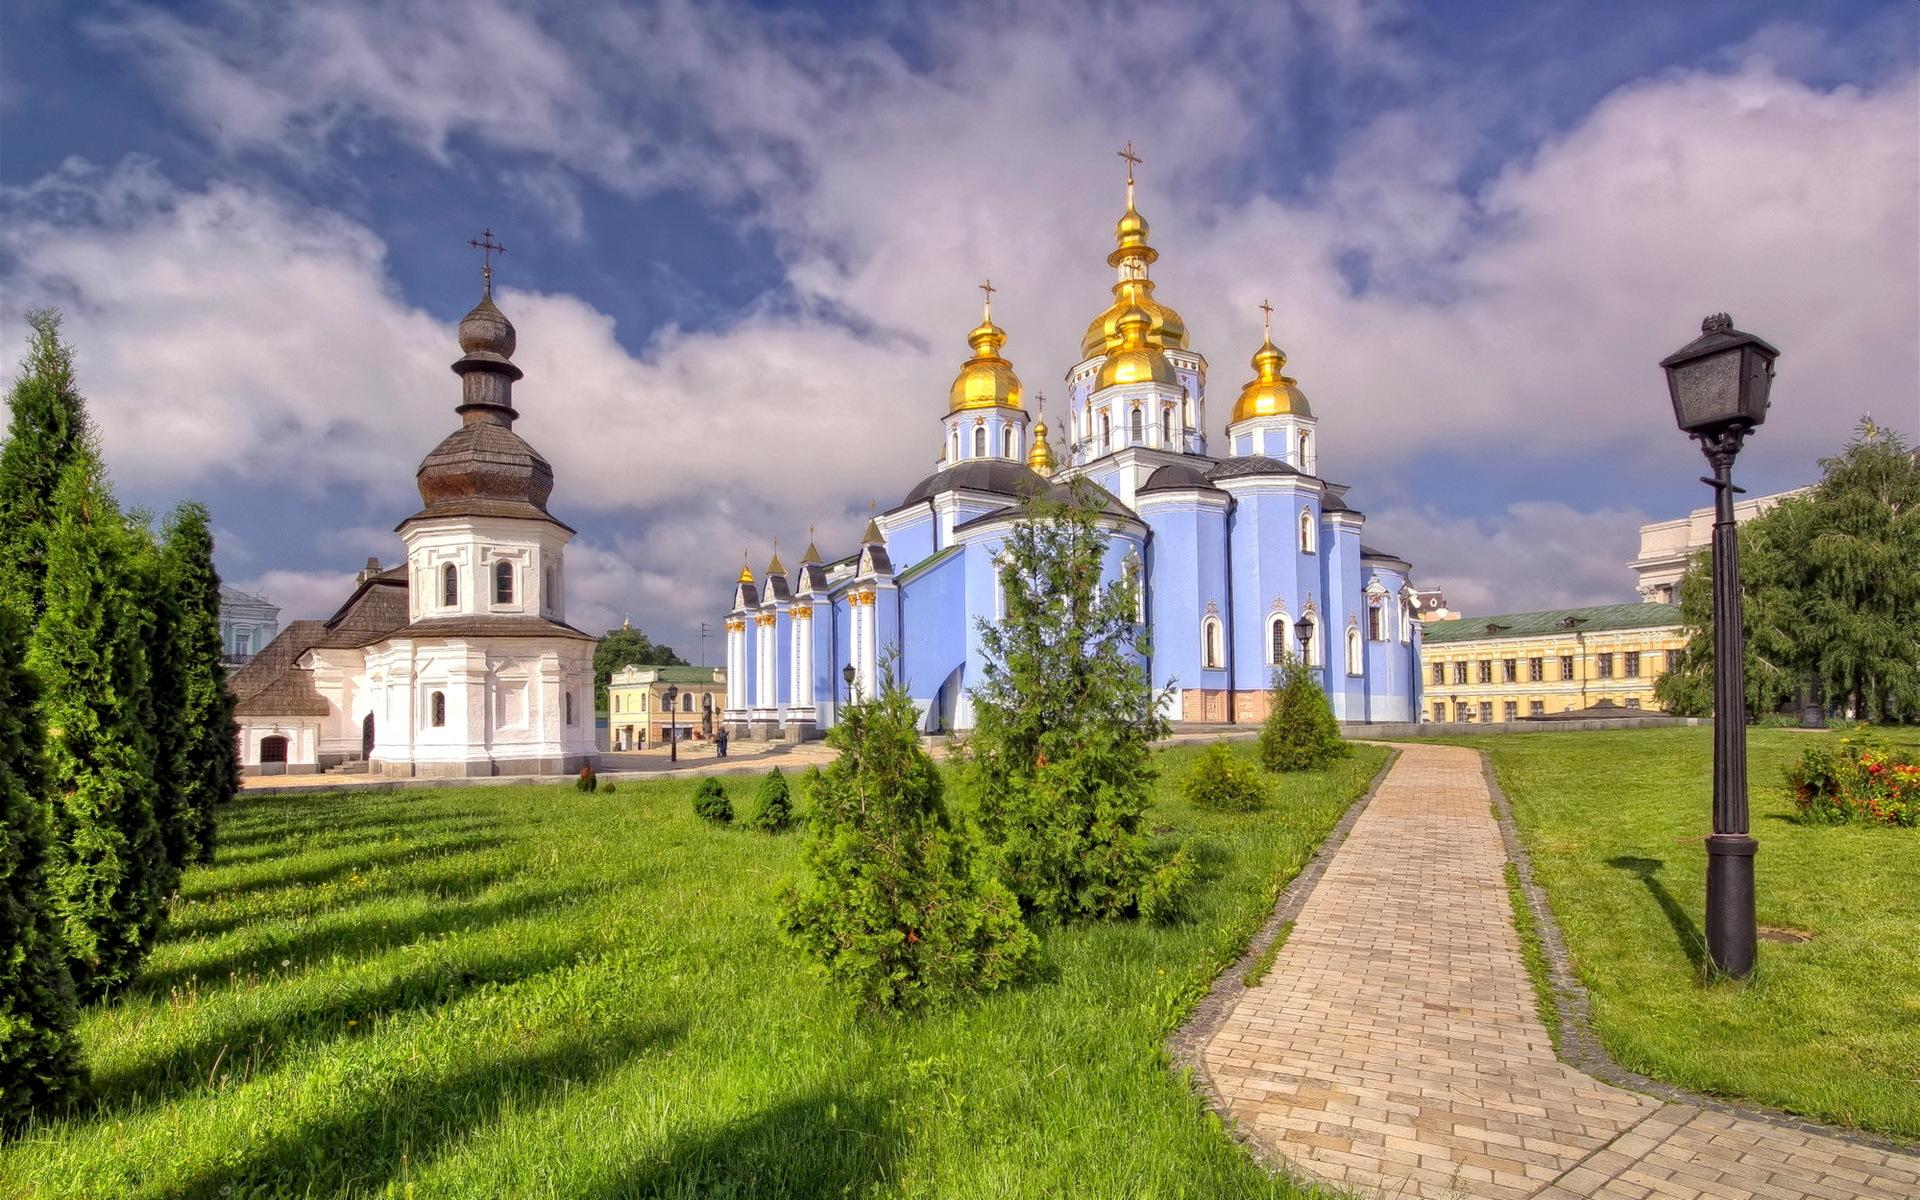 Обои на рабочий стол 1920х1080 храмы россии